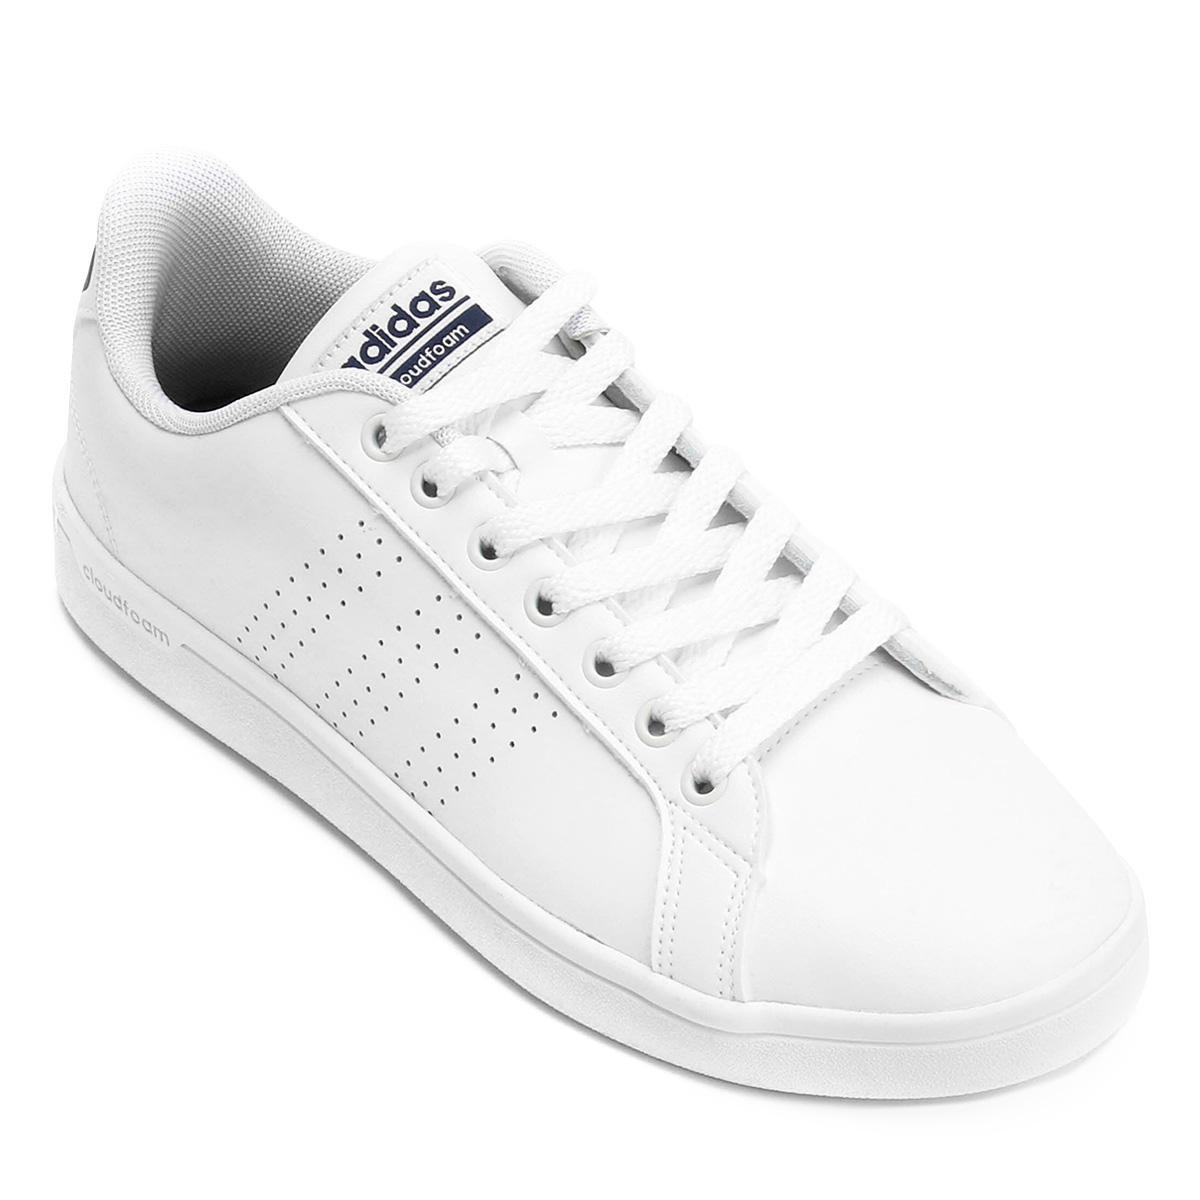 88e1b9c08 Tênis Adidas Cf Advantage Clean Masculino - Branco e Marinho | Allianz  Parque Shop